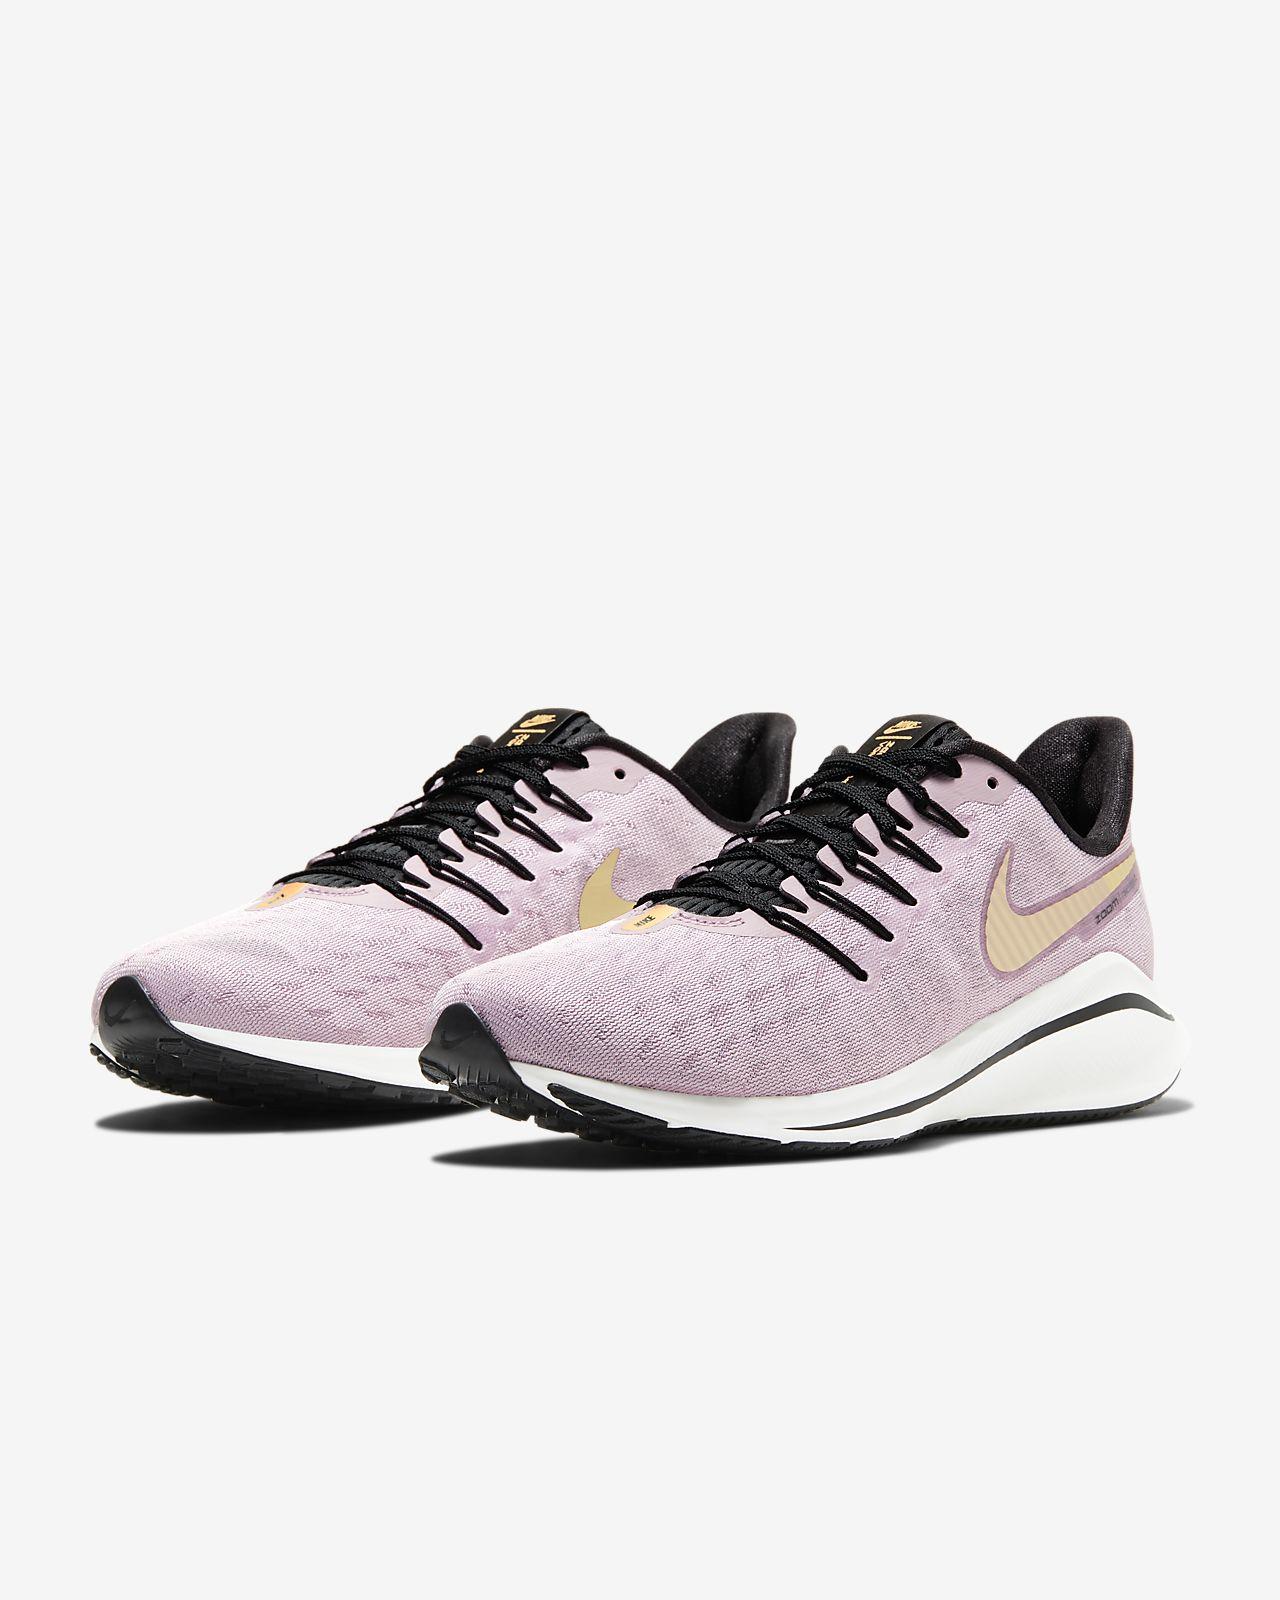 Scarpa da running Nike Air Zoom Vomero 14 Donna